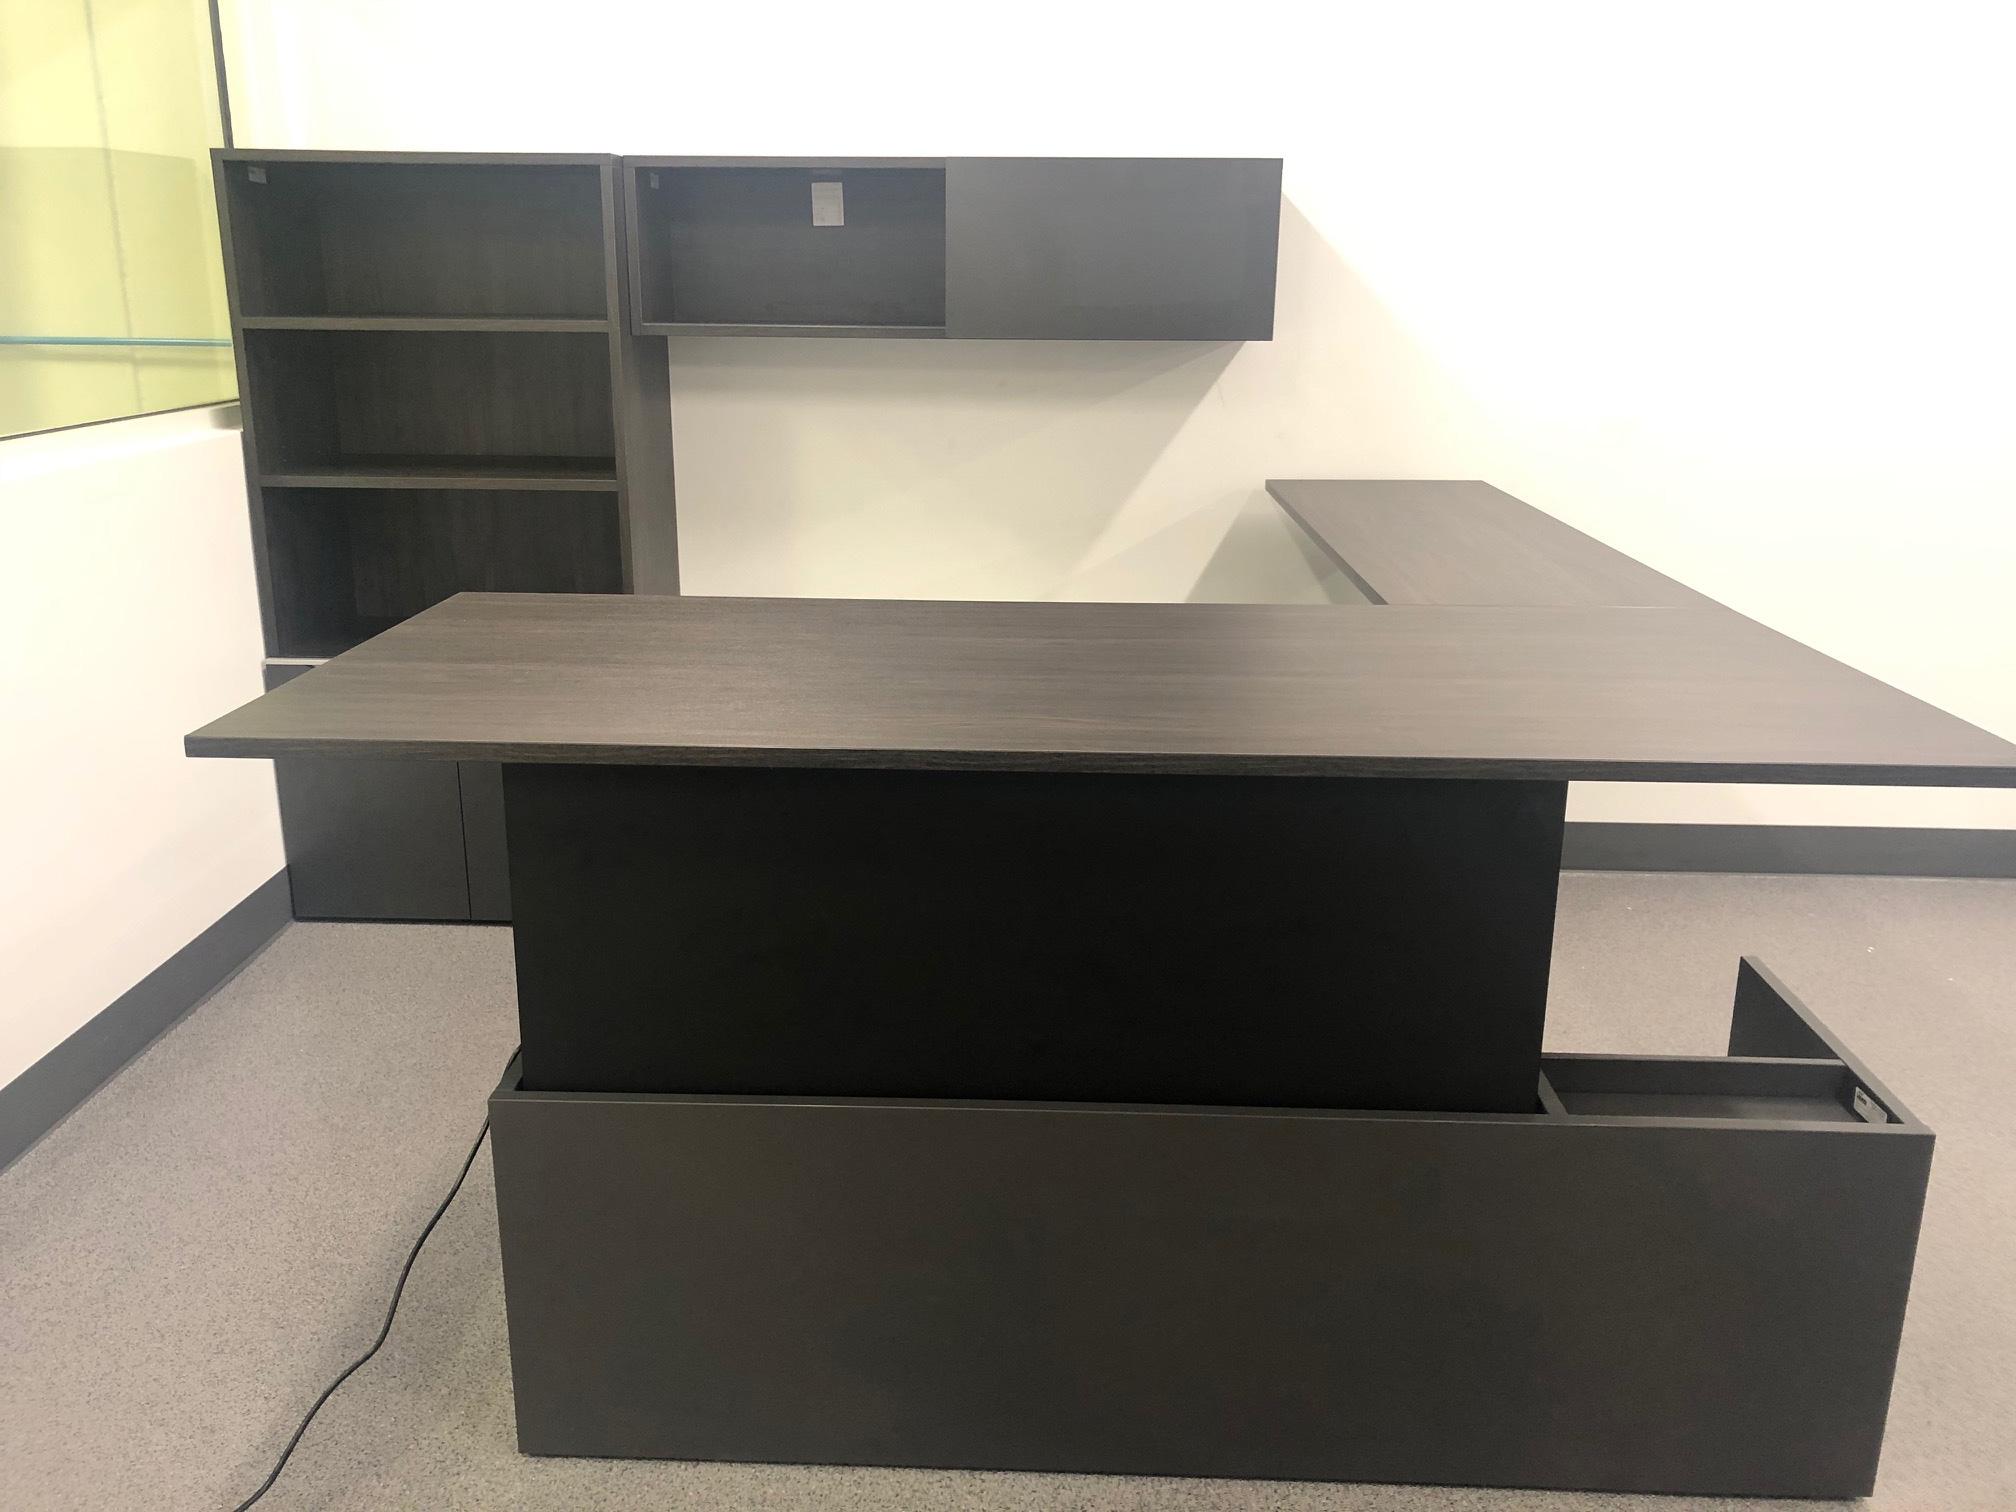 business-furniture-suppliers-in-miami-florida-1-5-.jpg